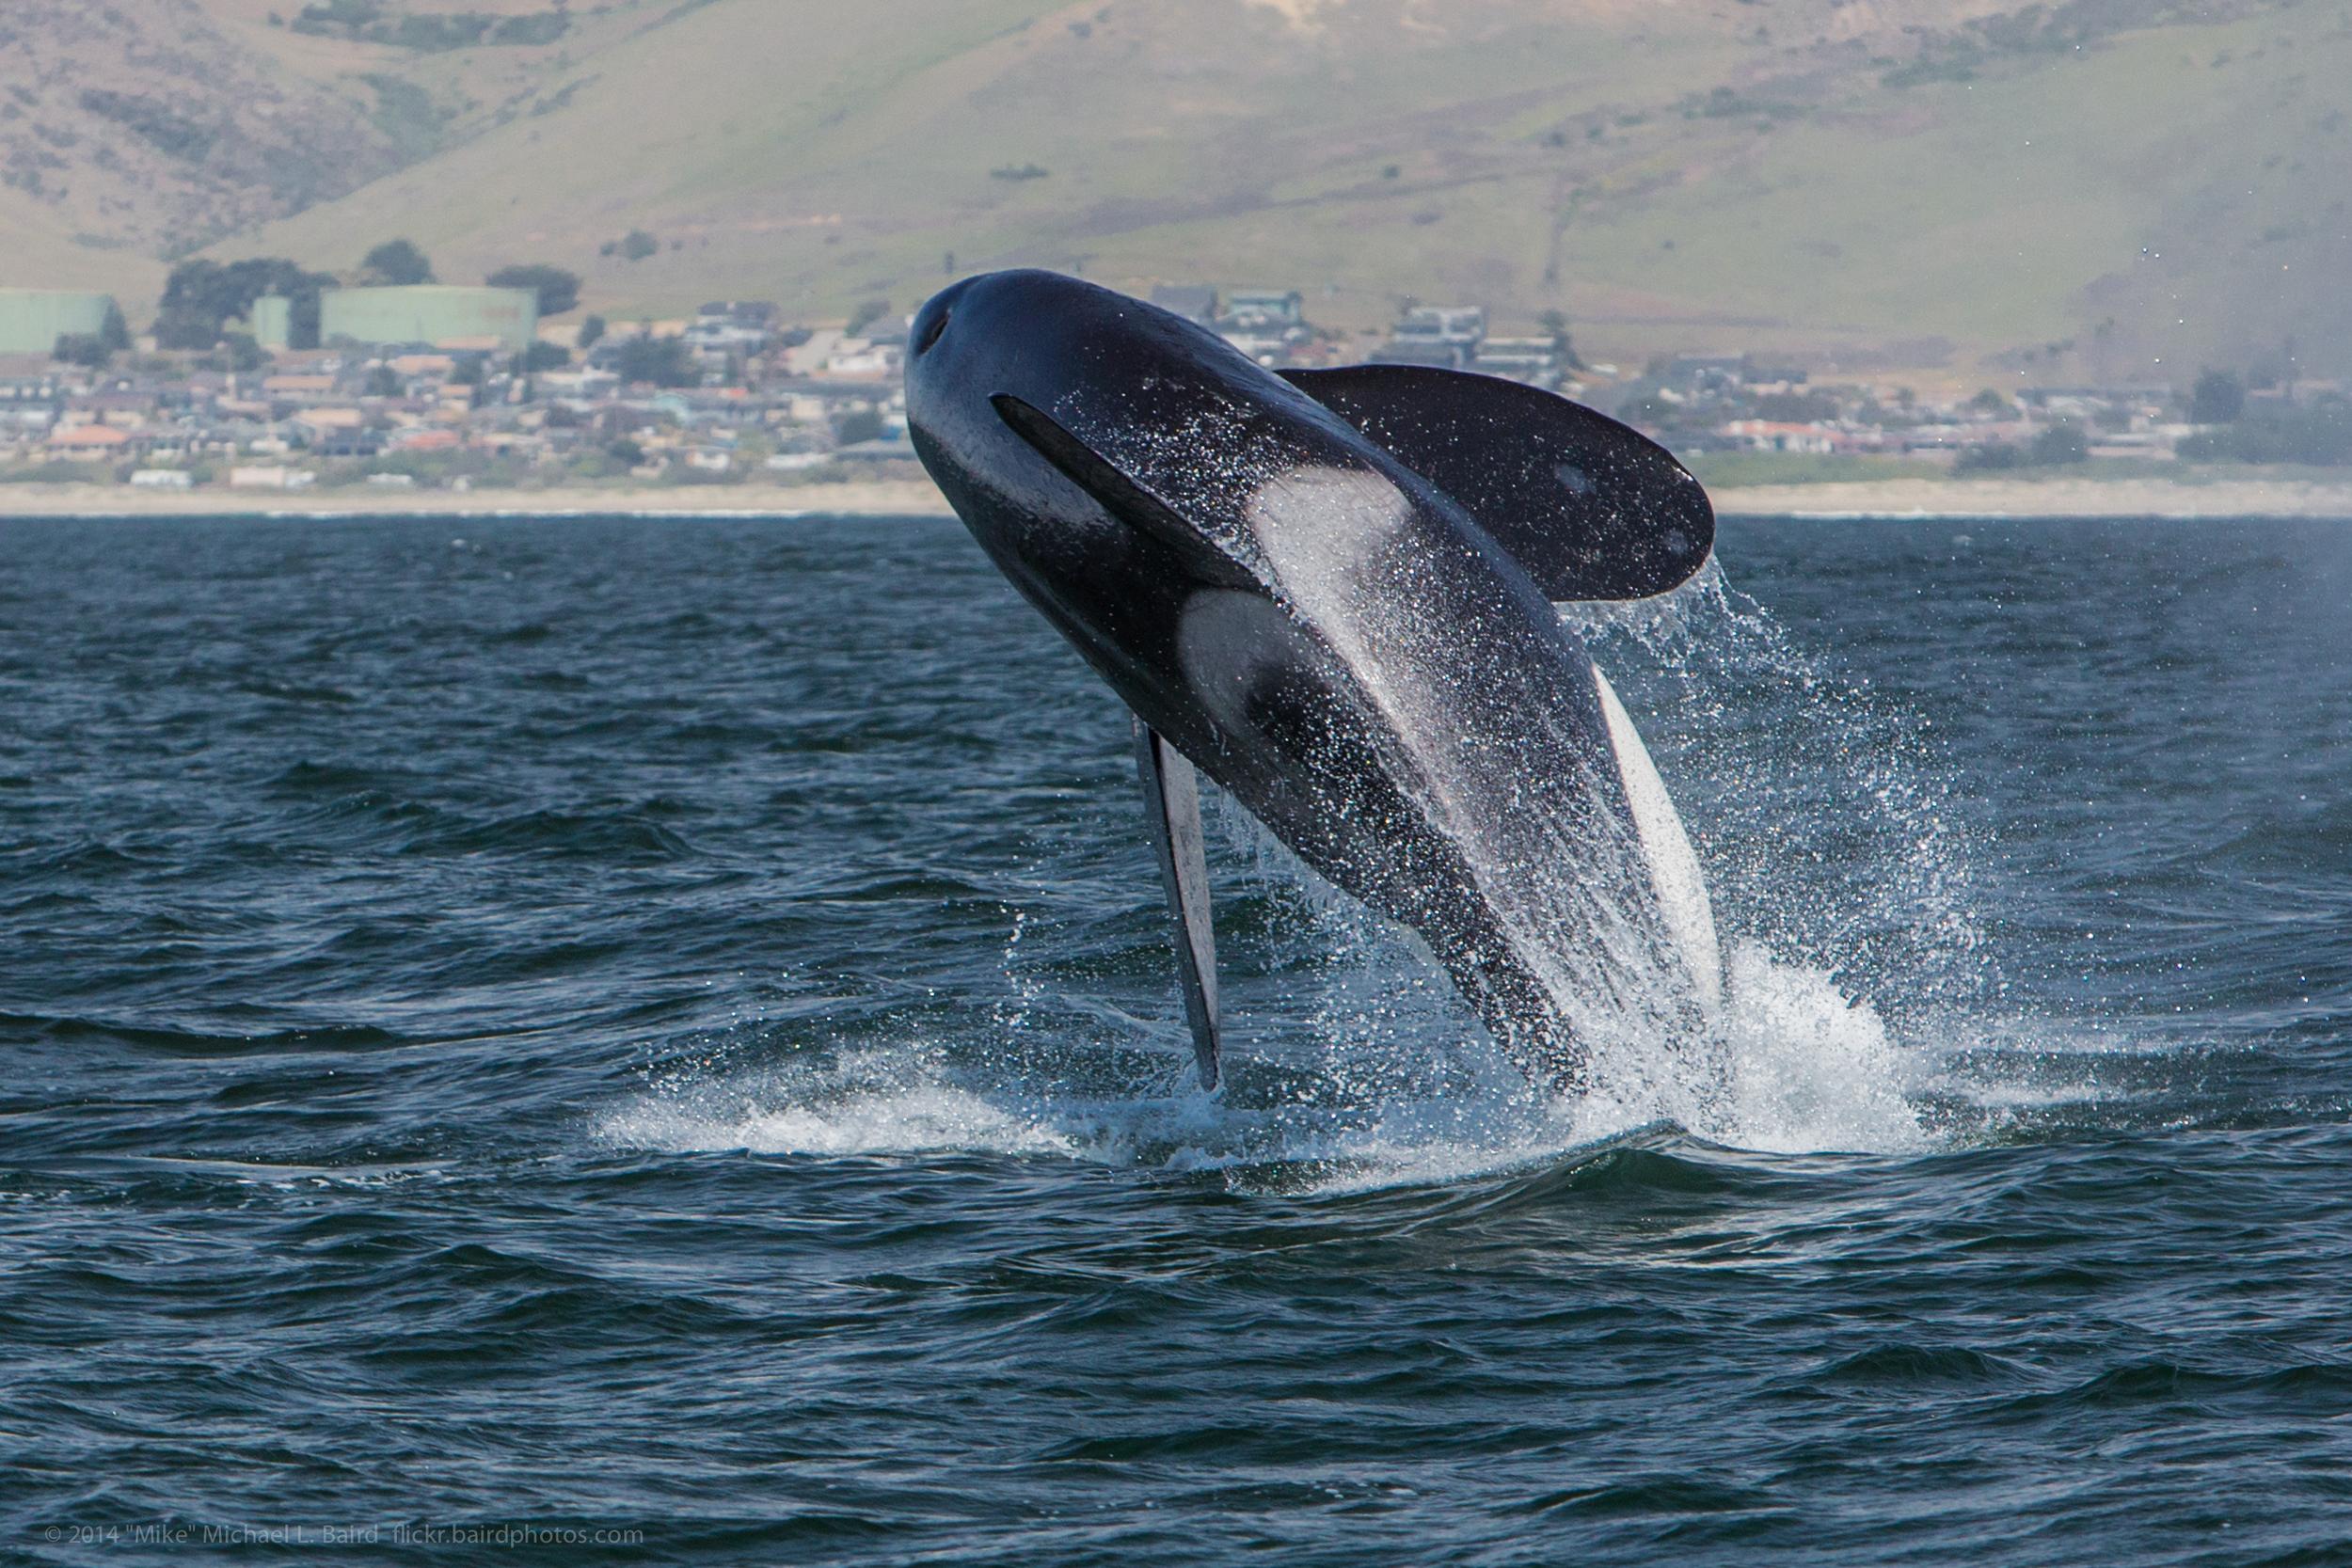 Orca,_Killer_Whale,_breaching_-_Morro_Bay,_CA_May_8,_2014_Orcinus_orca.jpg